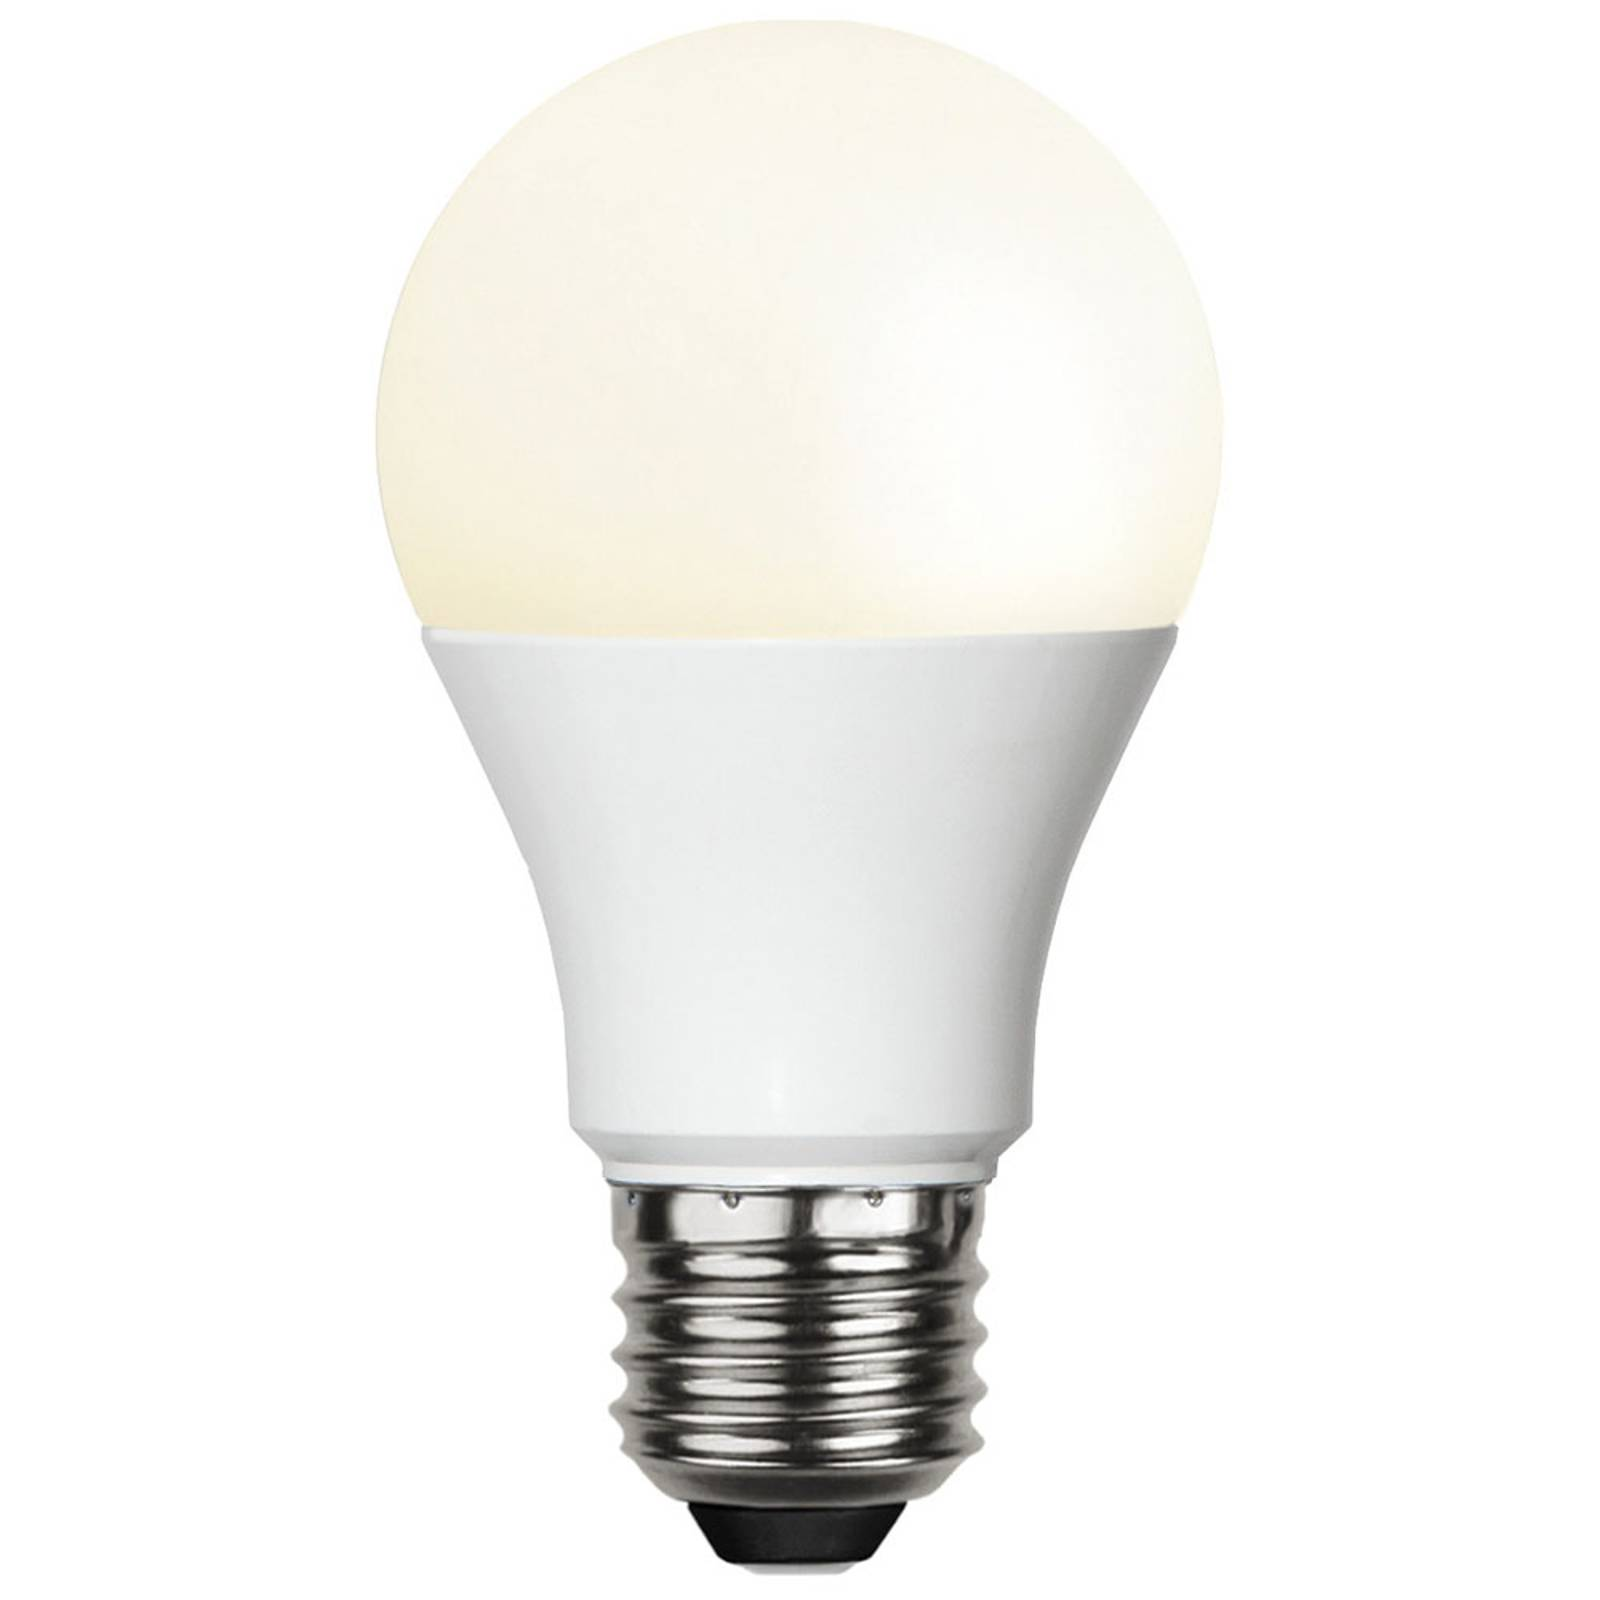 LED-lamppu E27 A60 4,5W kuumankestävä 470lm 2700K